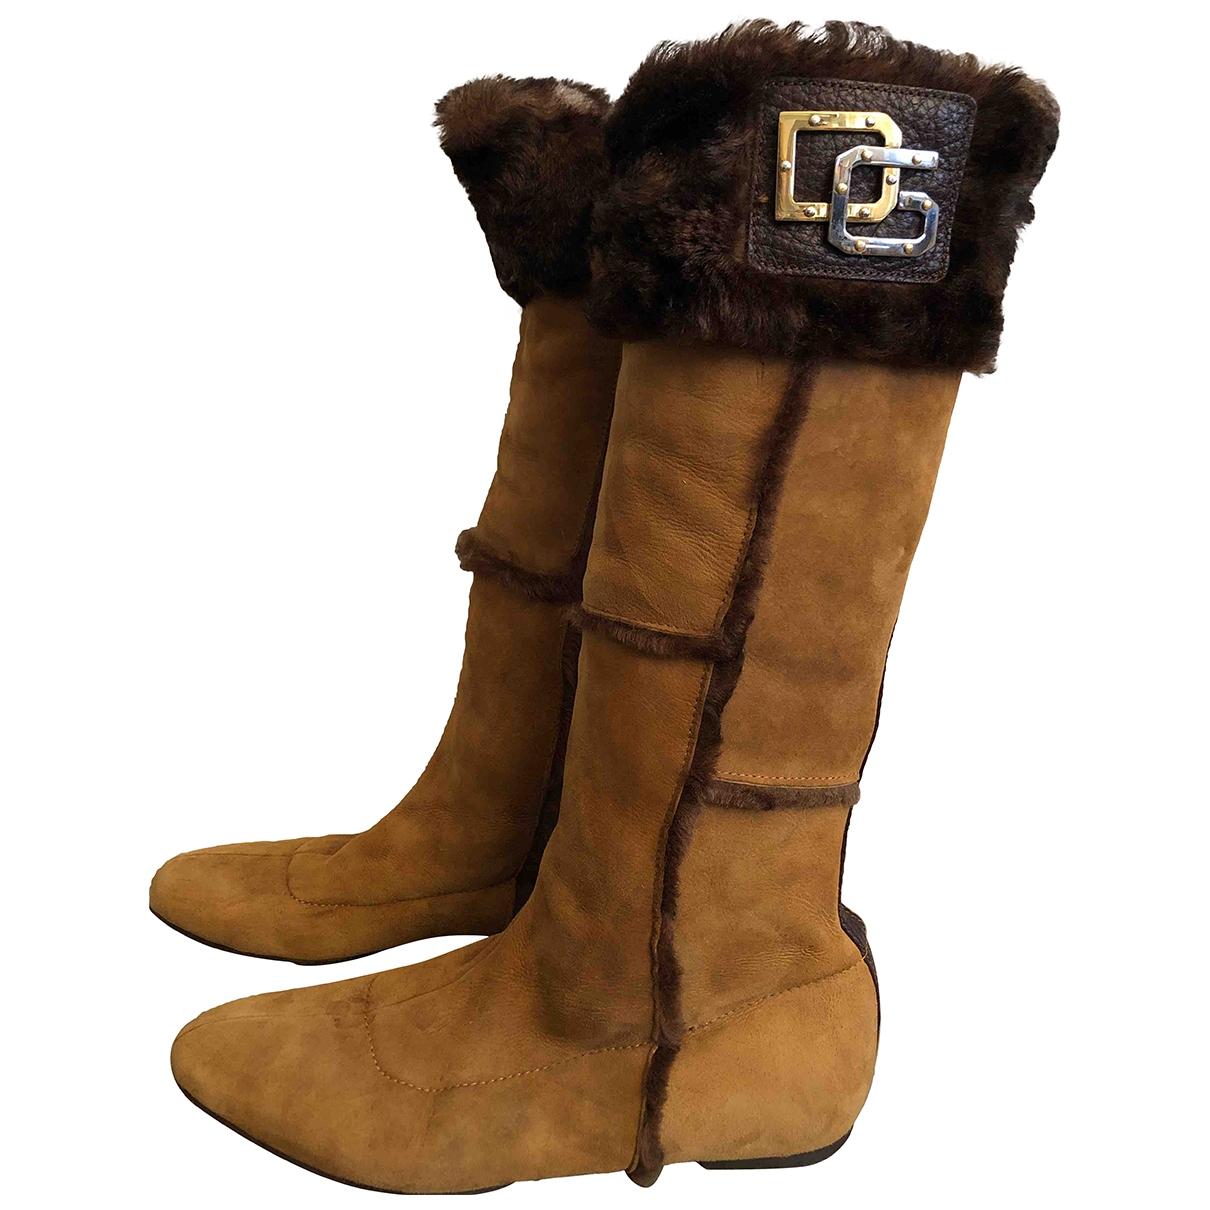 Botas Dolce & Gabbana